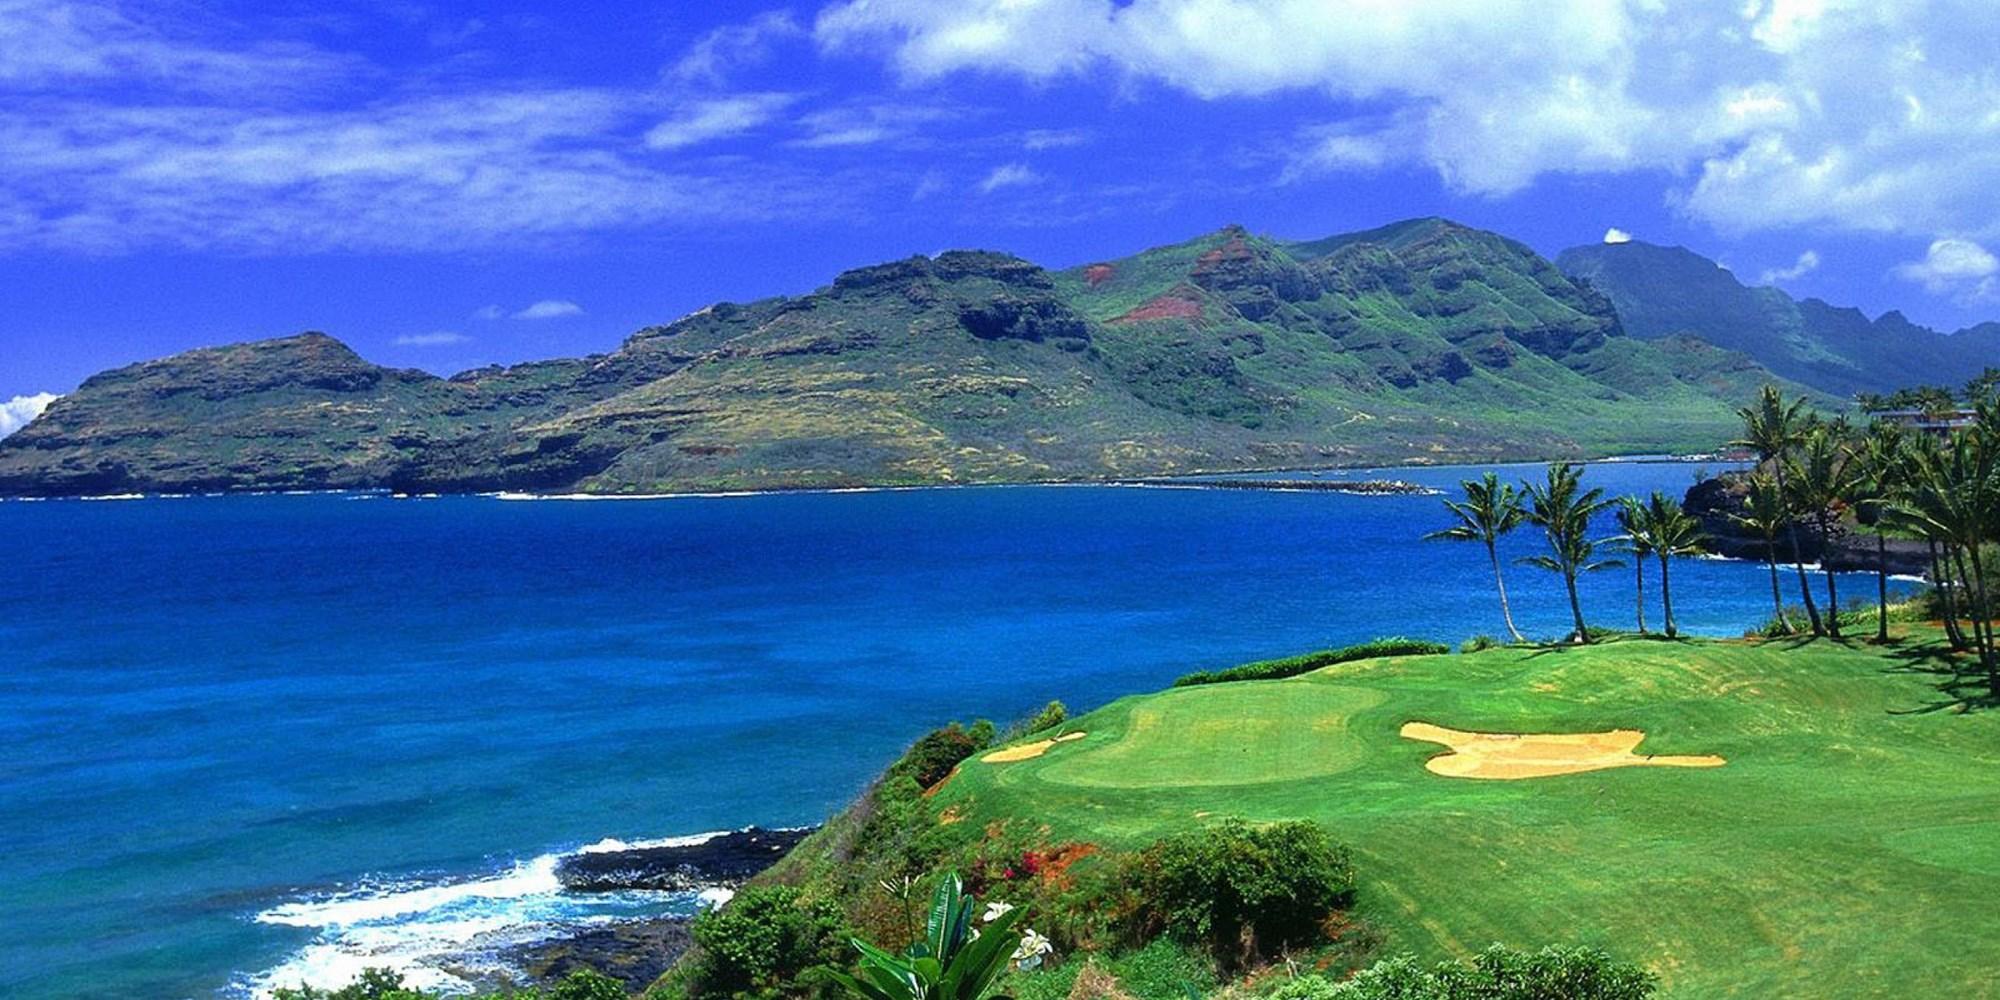 Cost Of Car Insurance >> GOLFSelect - Golf Holidays - USA - Oahu, Hawaii | 7 nights ...